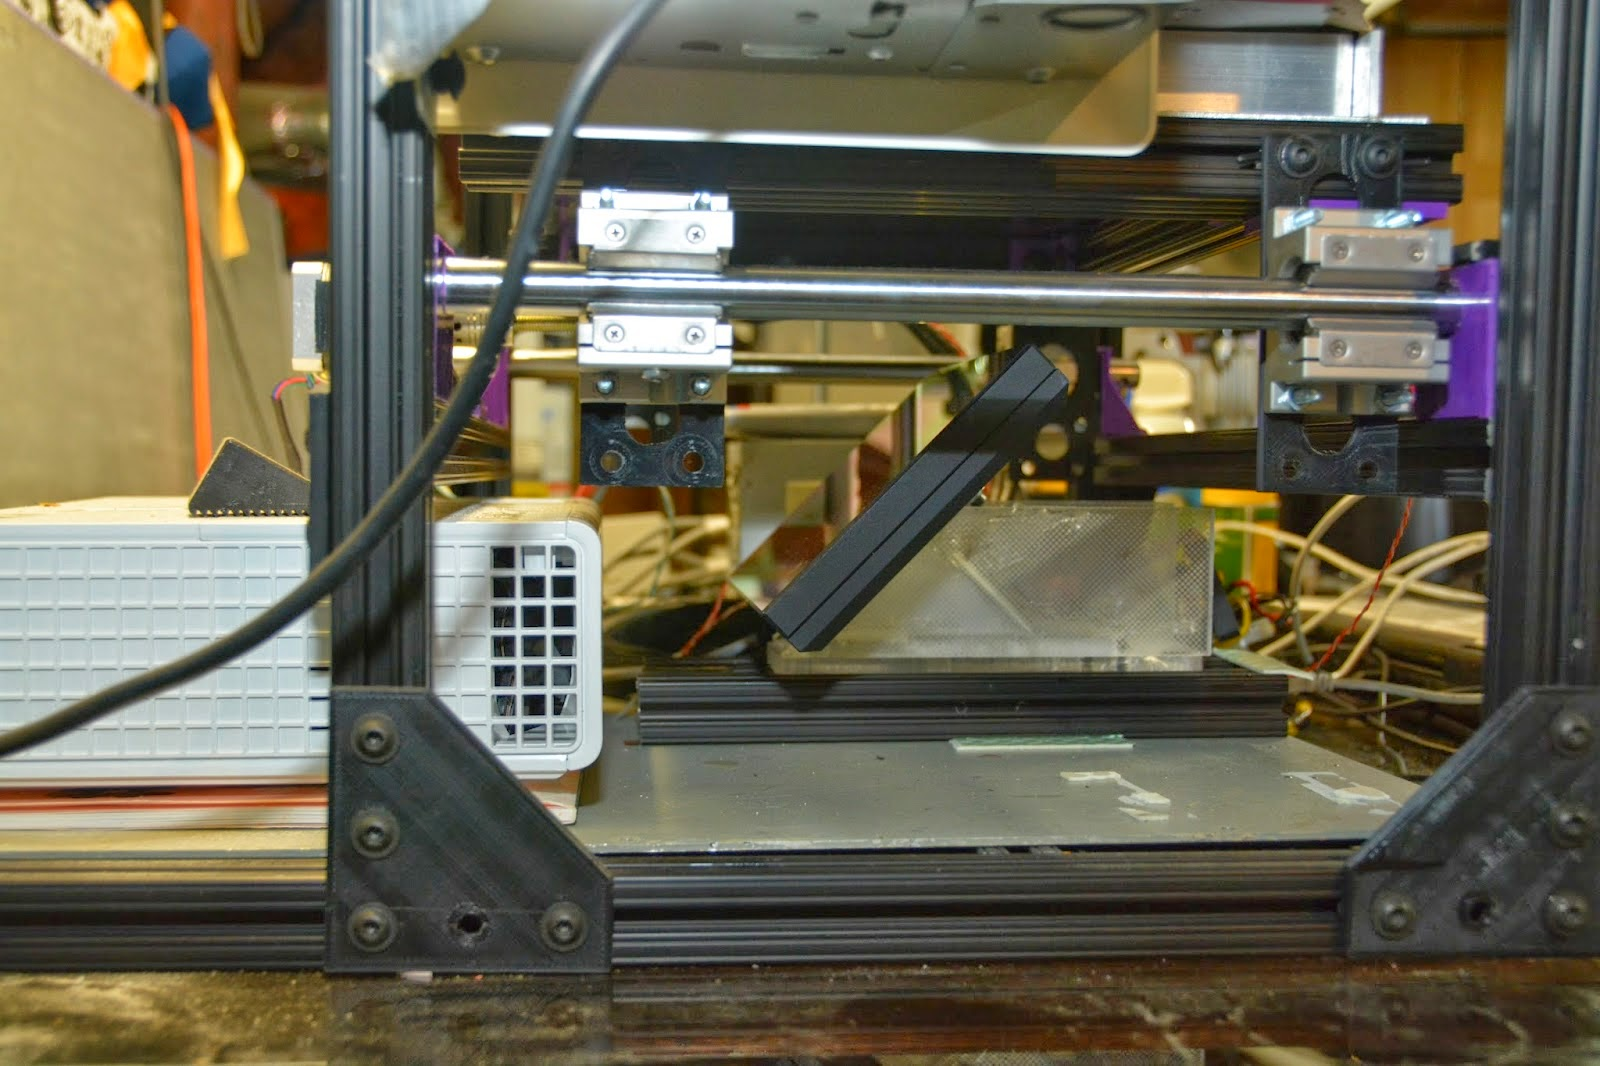 Aluminum frame diy 3d dlp printer by dan beaven article for 3d printer build plans